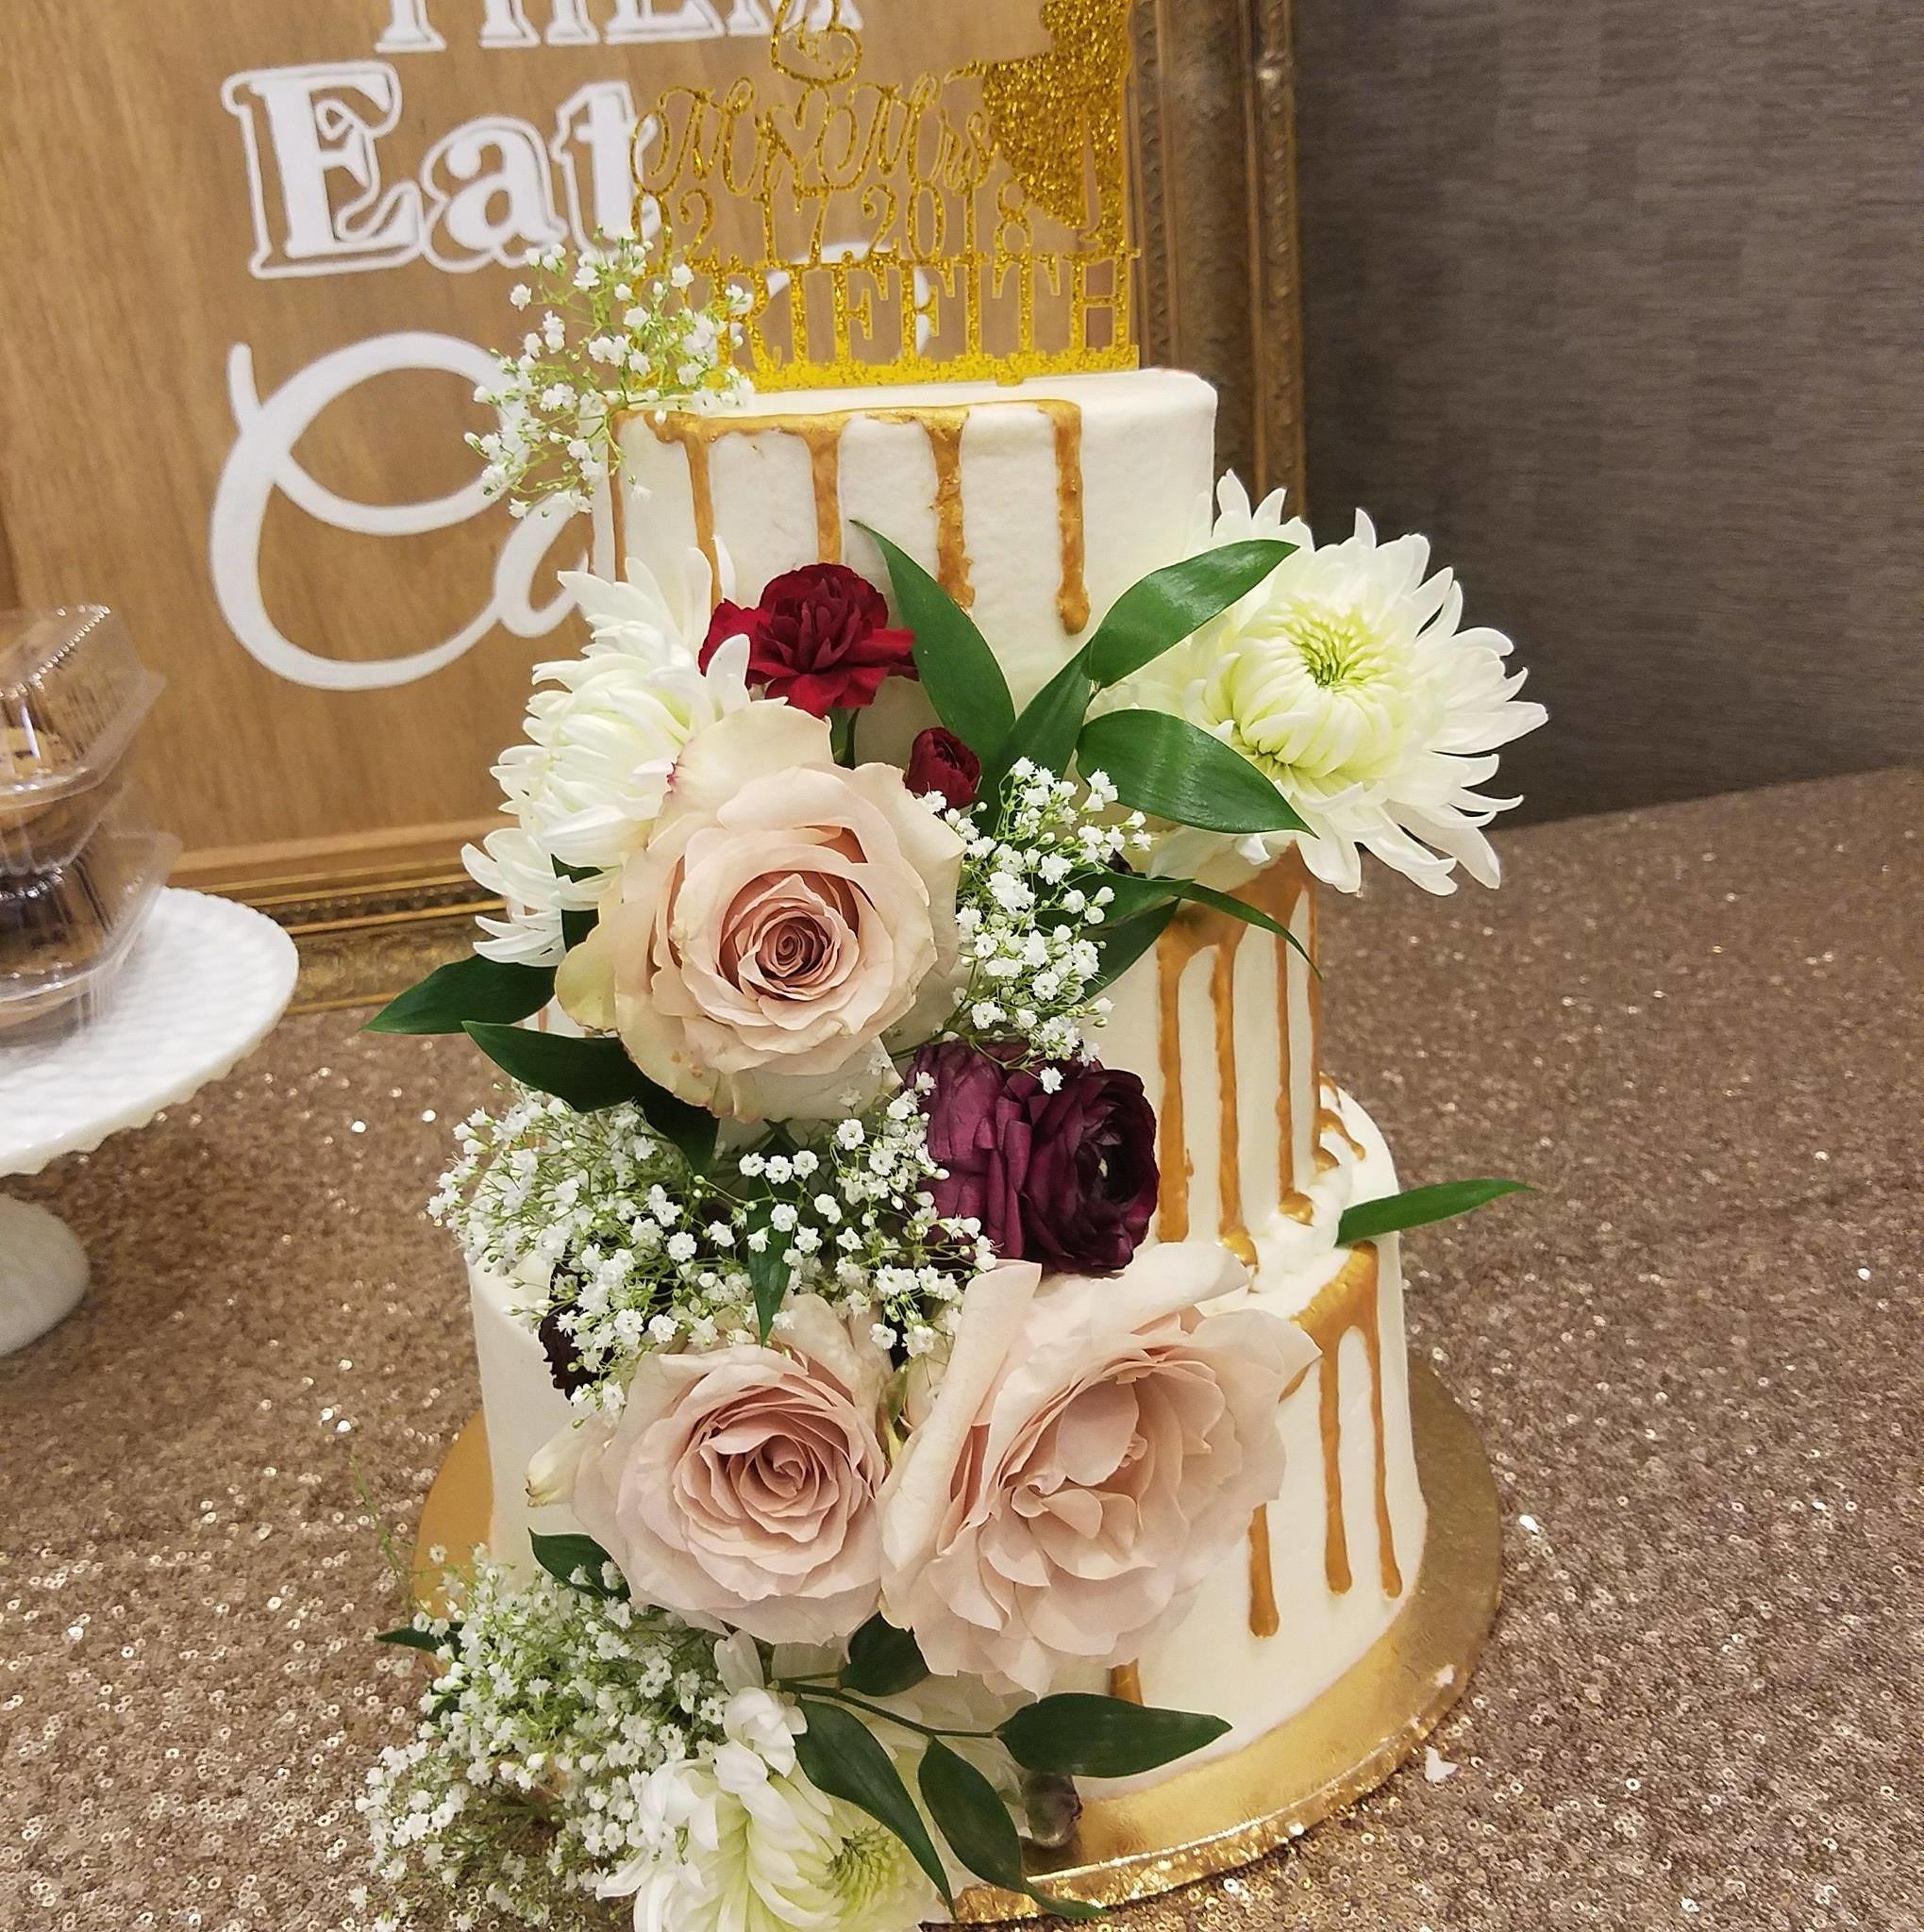 Cake by Sue Ann's Bakery